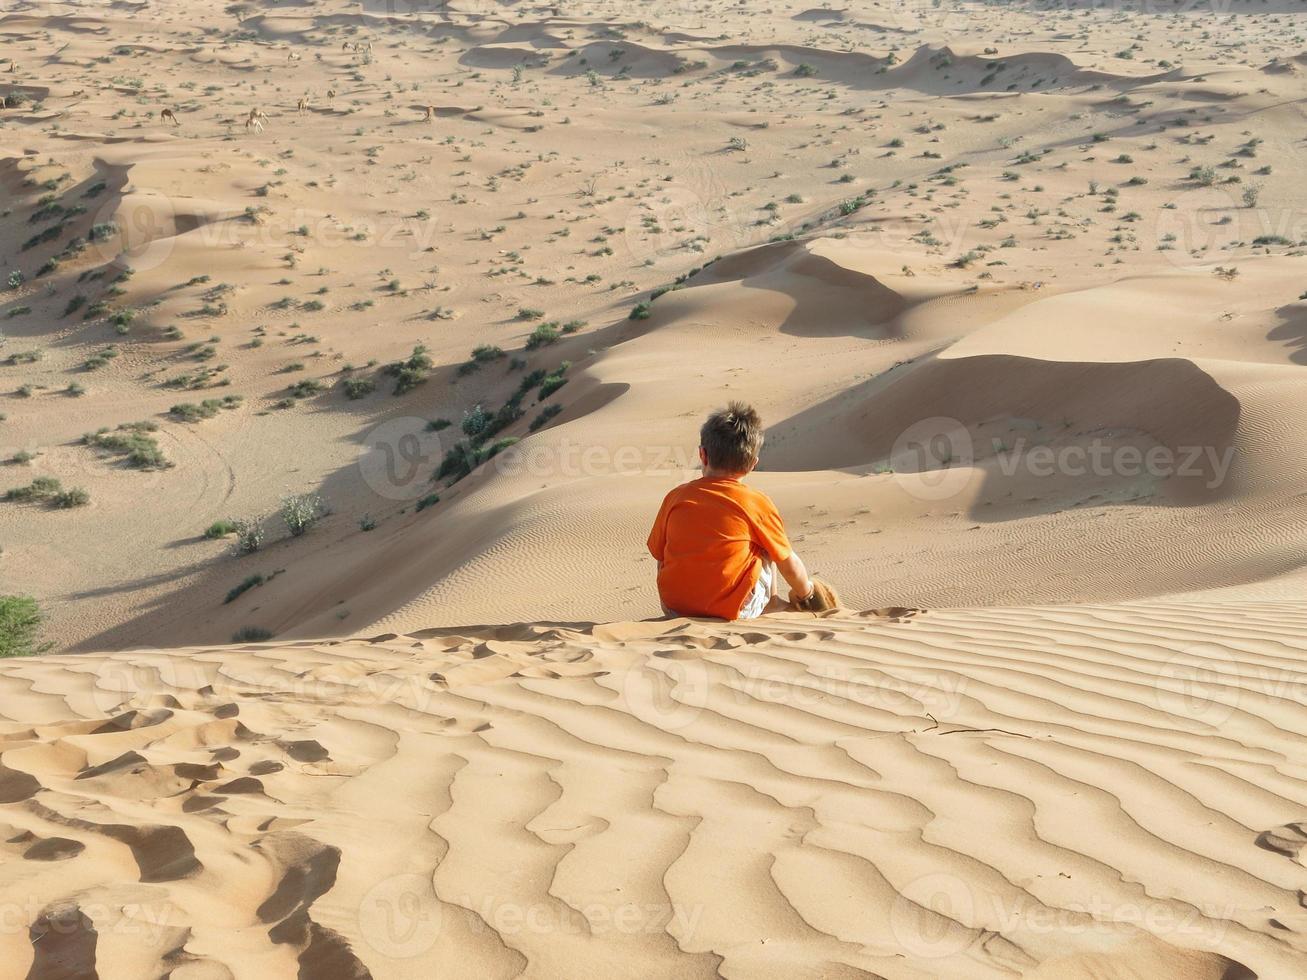 Caucasian boy sitting on sand dune rear view photo